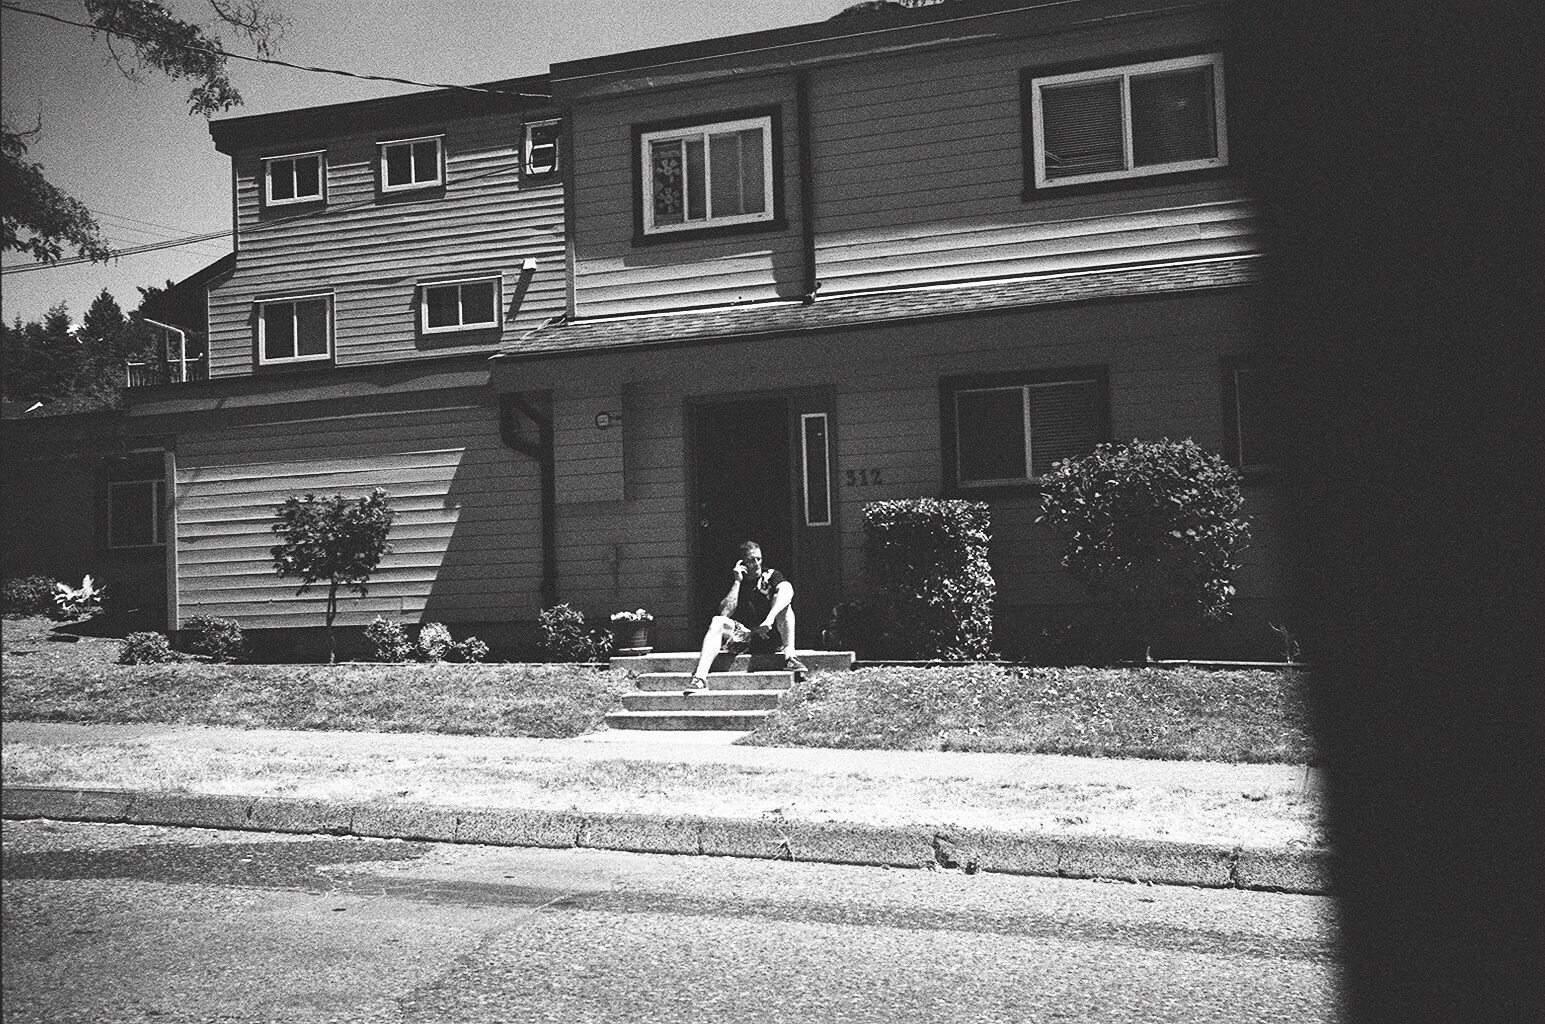 eric-kim-street-photography-europe-2015-trix1600-leica-35mm-black-and-white-1154